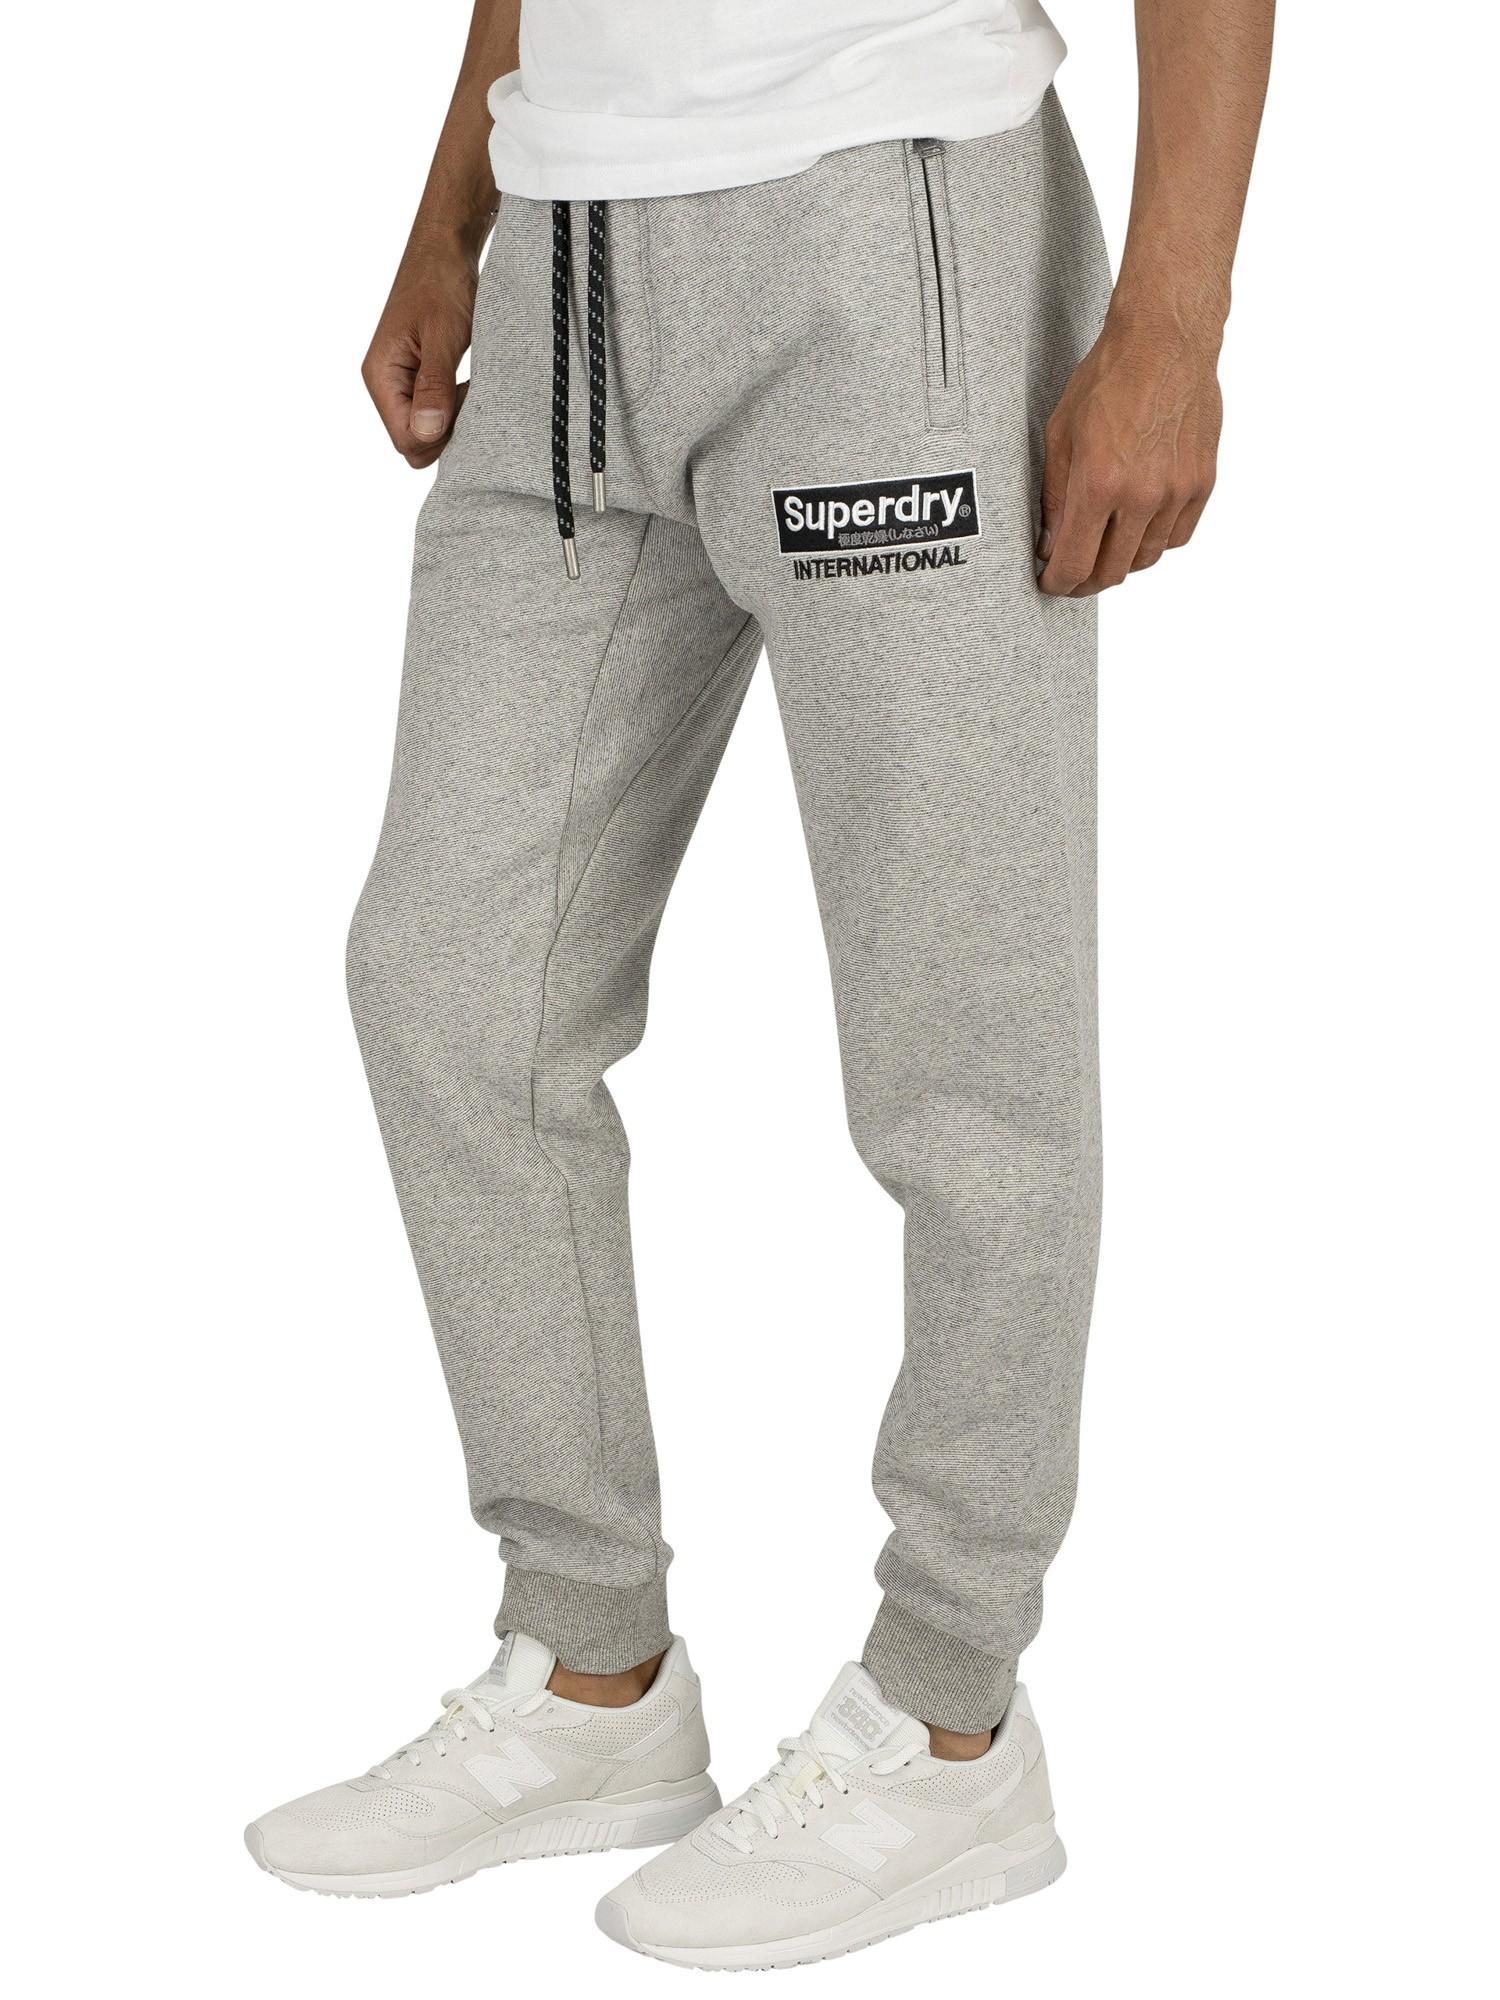 Detalles de Nike Sportswear Tech Fleece pantalones pantalones deportivos caballeros 805162 063 gris ver título original